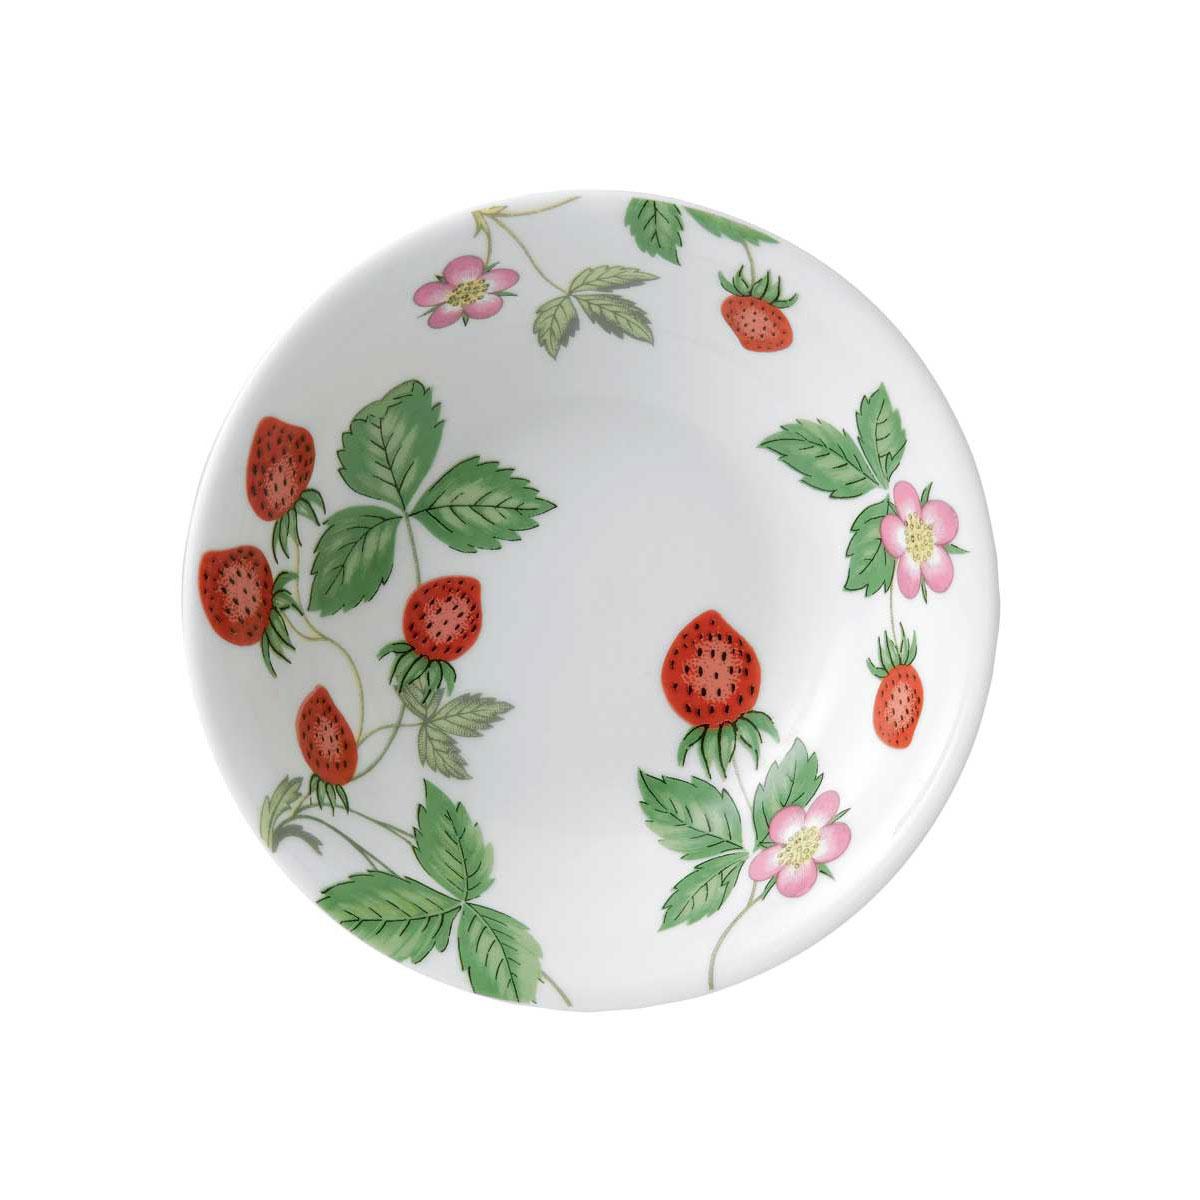 Wedgwood China Wild Strawberry Nurseryware Oatmeal Bowl